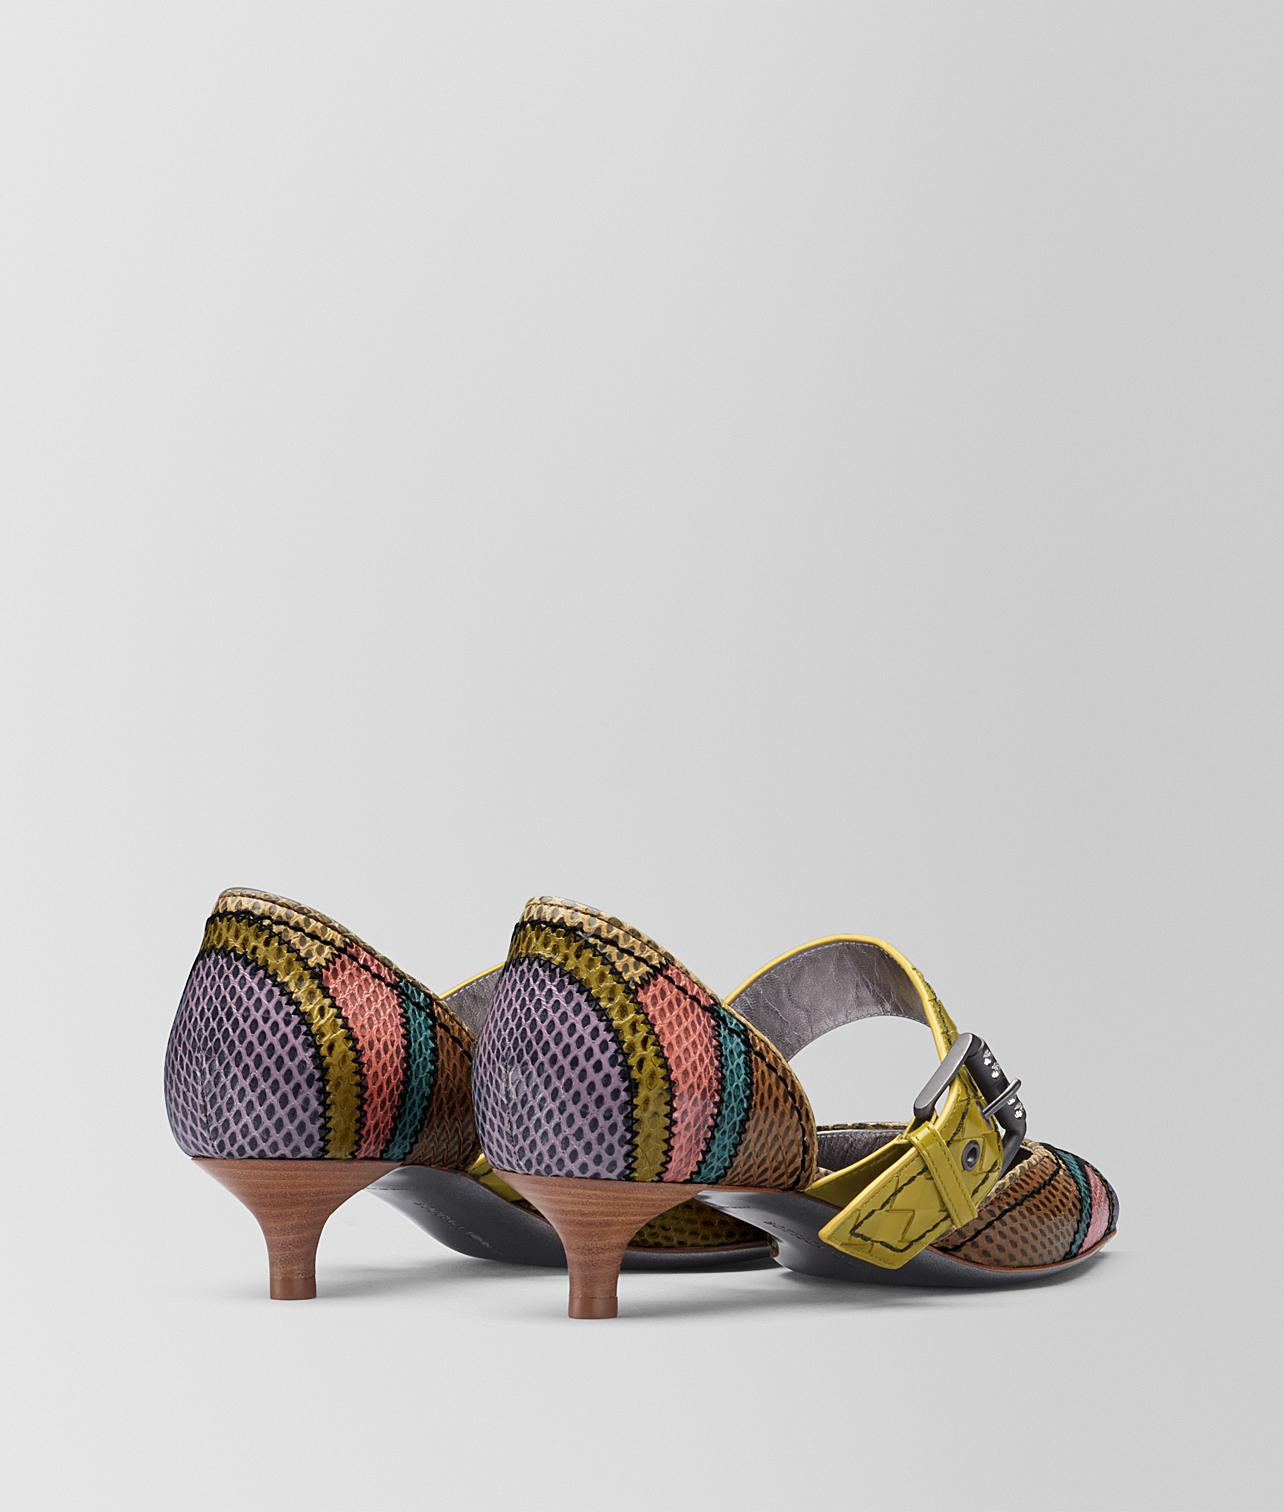 e606f7711c0 Lyst - Bottega Veneta Multicolor Ayers D orsay Kitten Heel